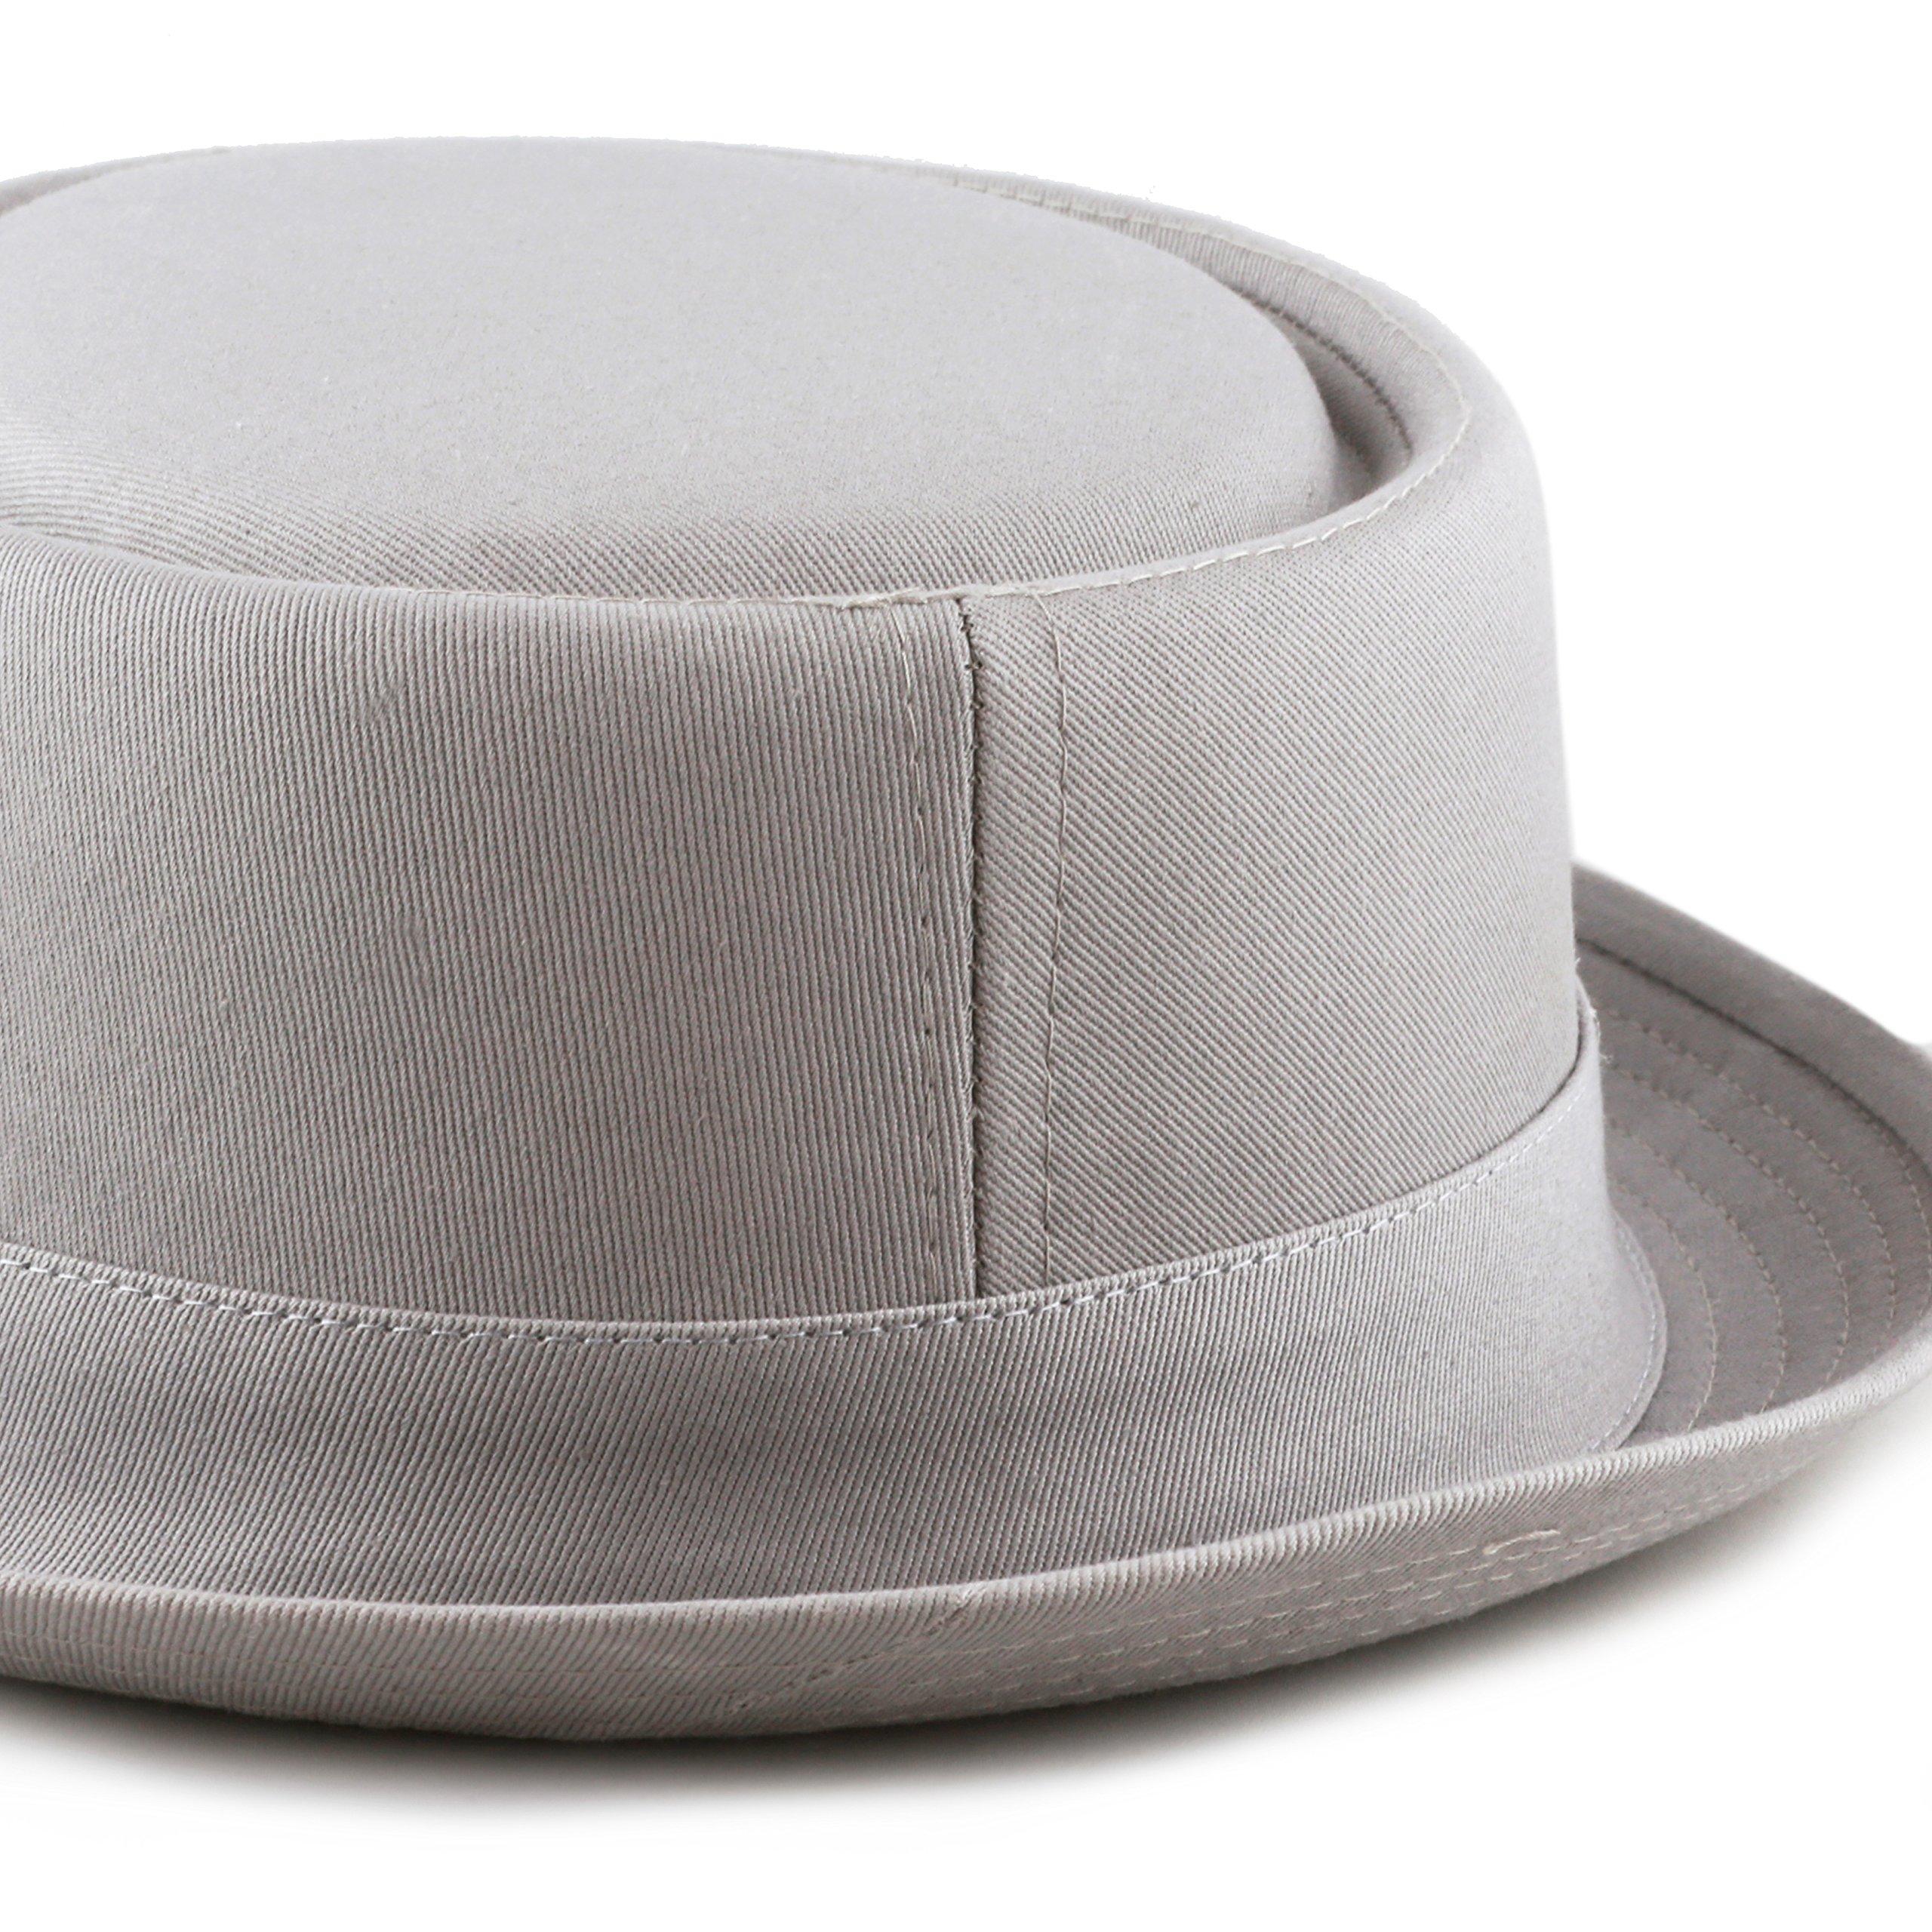 THE HAT DEPOT Black Horn Cotton Plain Pork Pie Hat (Large, Grey) by THE HAT DEPOT (Image #7)